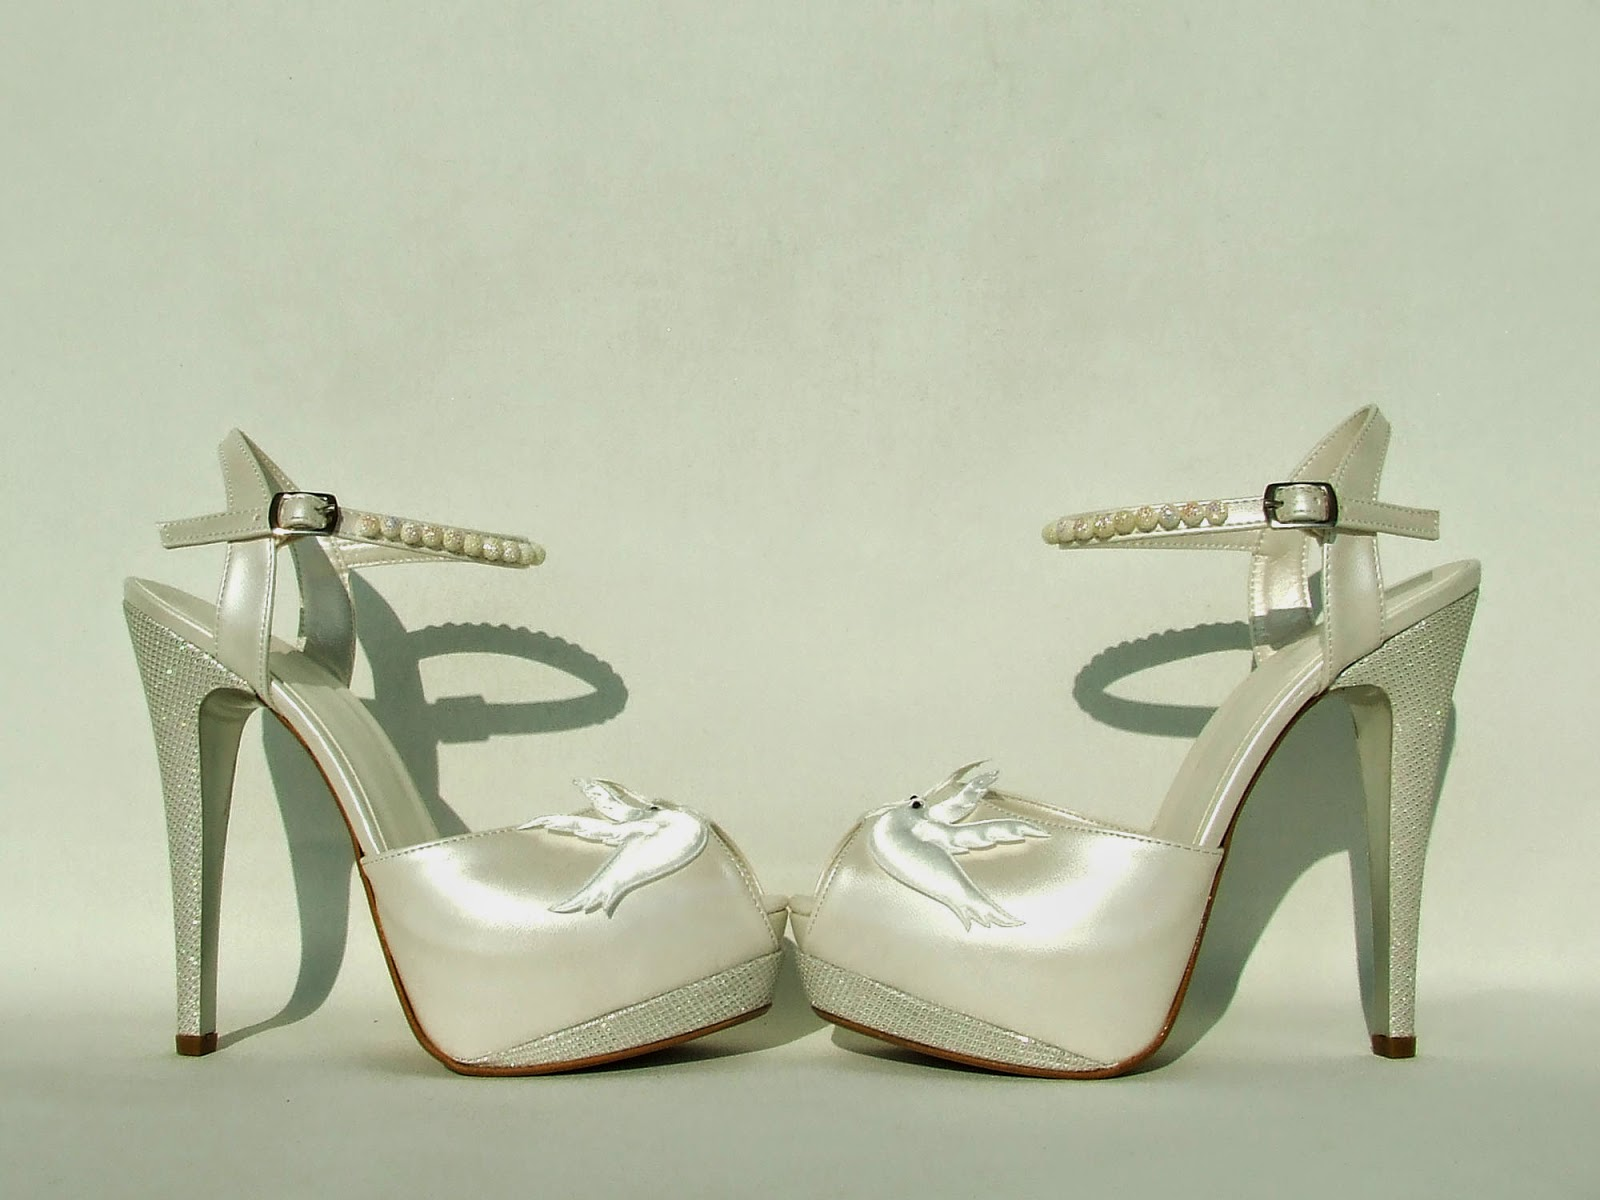 Kukla shoes by rana öztok